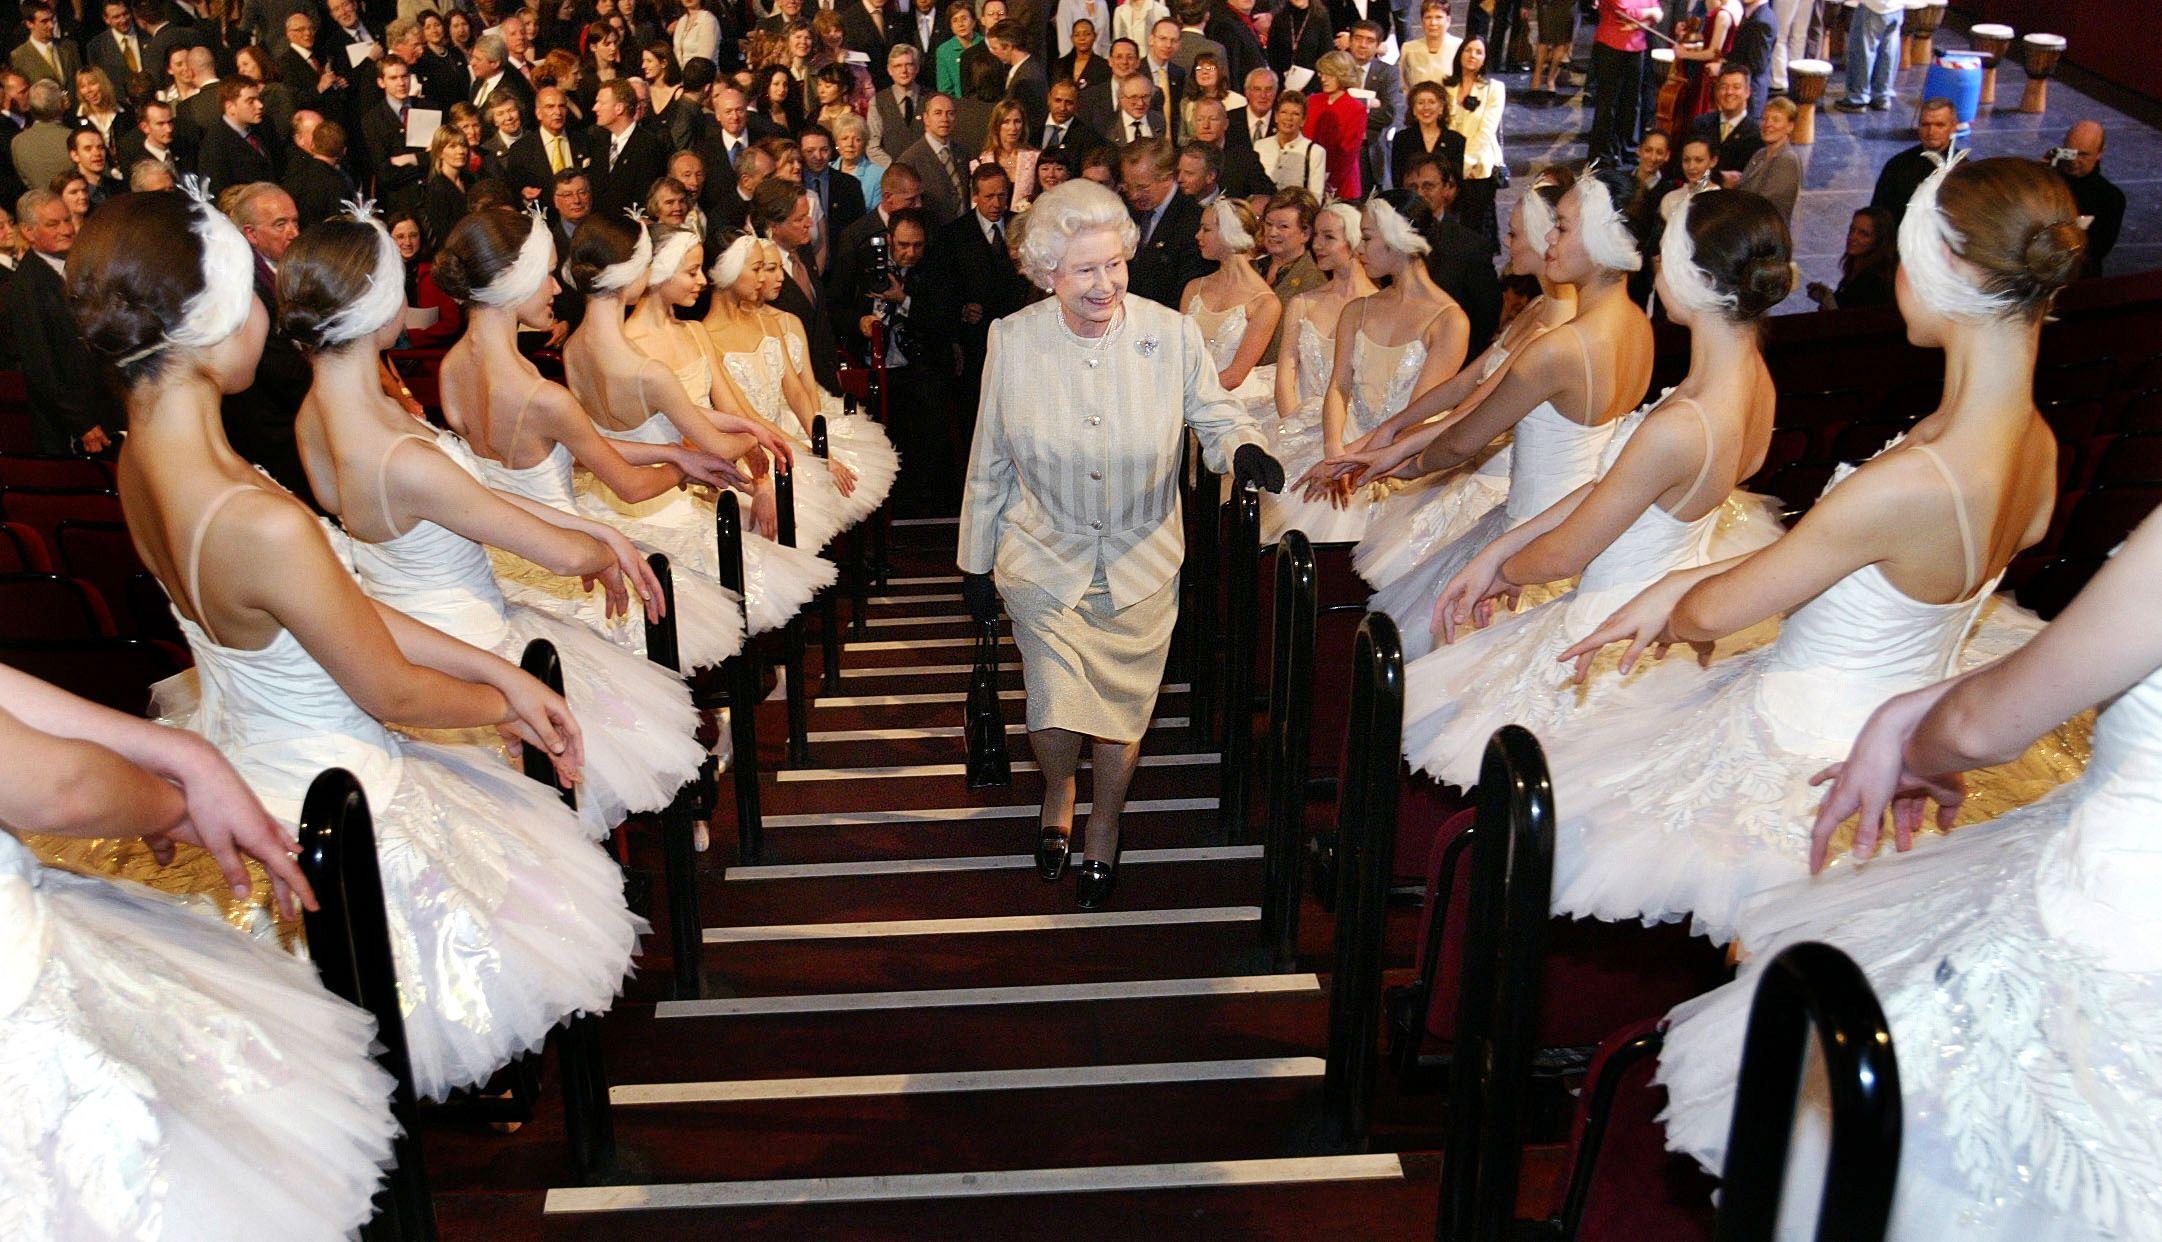 26 Beautiful Photos of the Royal Family at the Ballet